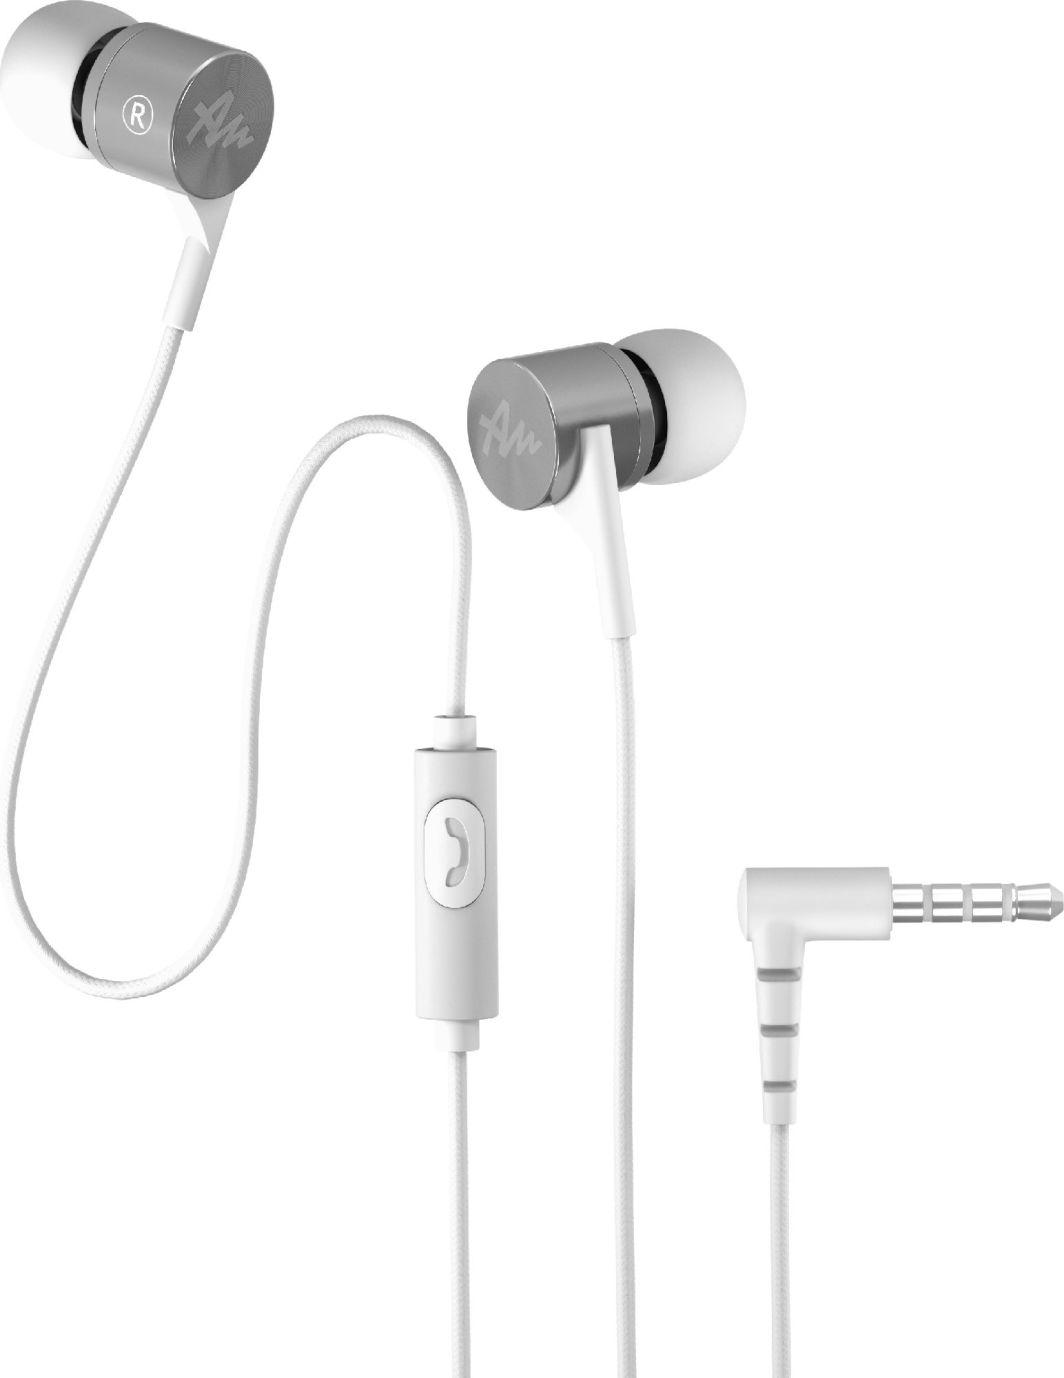 Słuchawki Audictus Explorer White (AWE-0964) 1